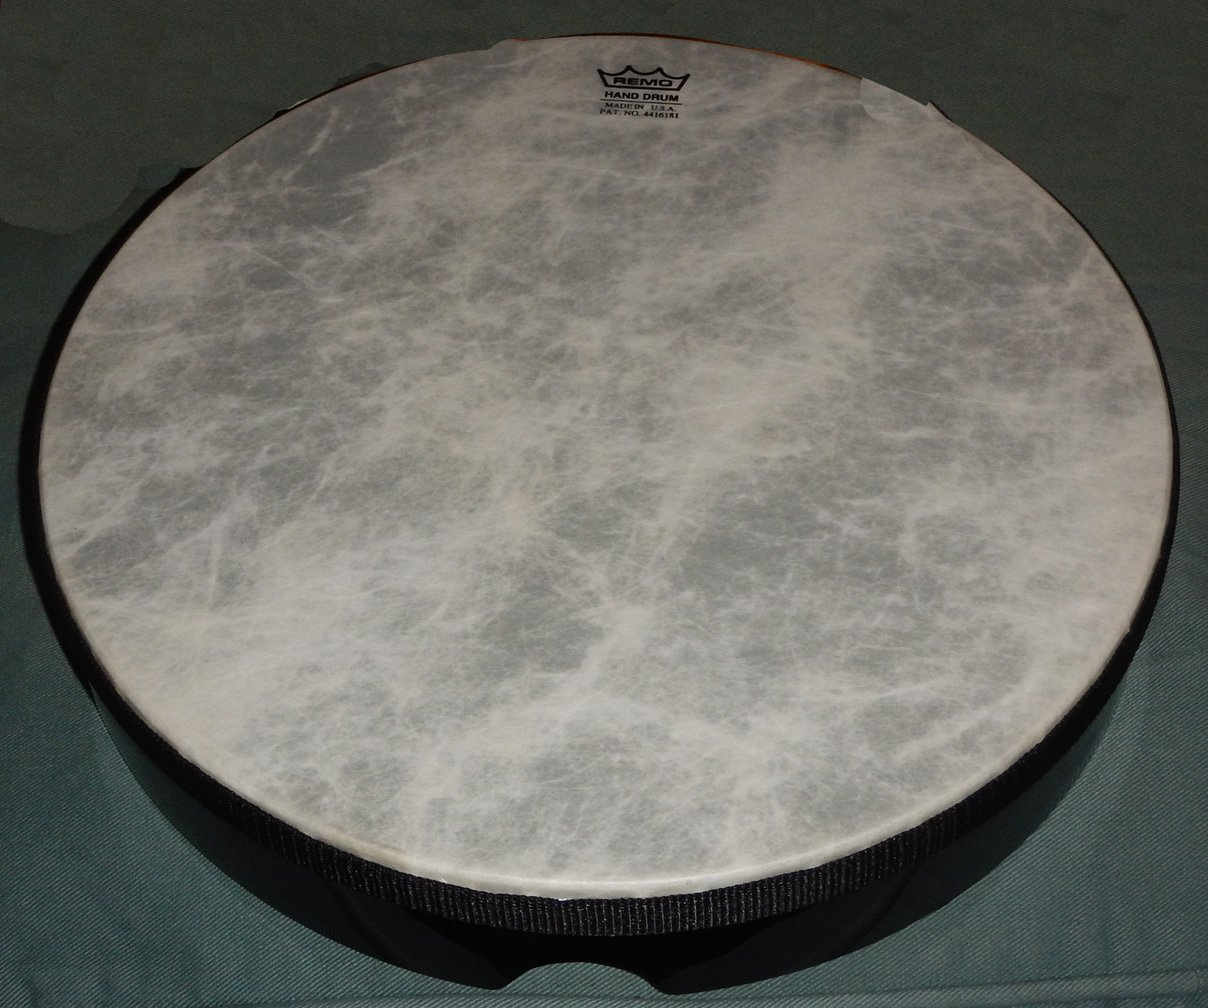 Amazon.com: REMO GLEN VELEZ FRAME DRUM: Musical Instruments